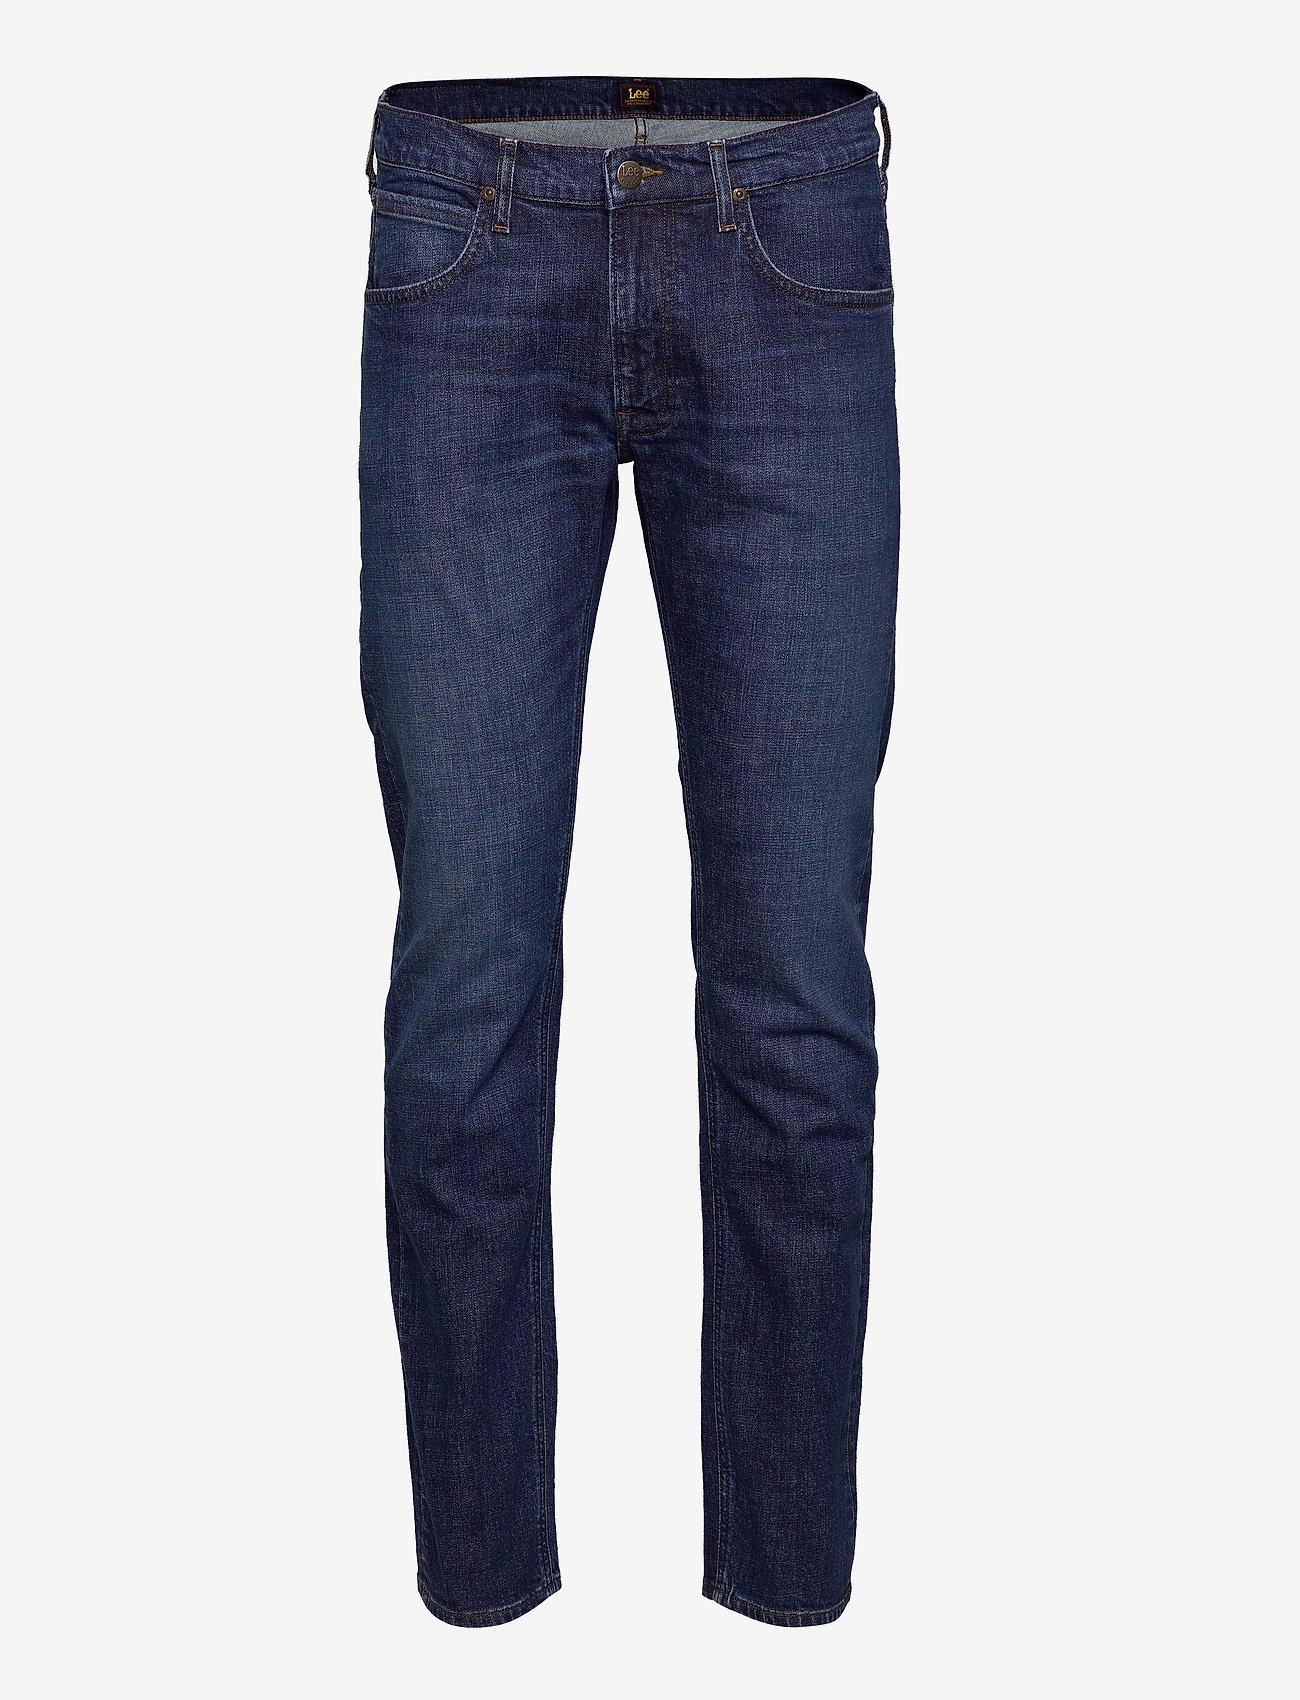 Lee Jeans - DAREN ZIP FLY - slim jeans - mid foam - 0